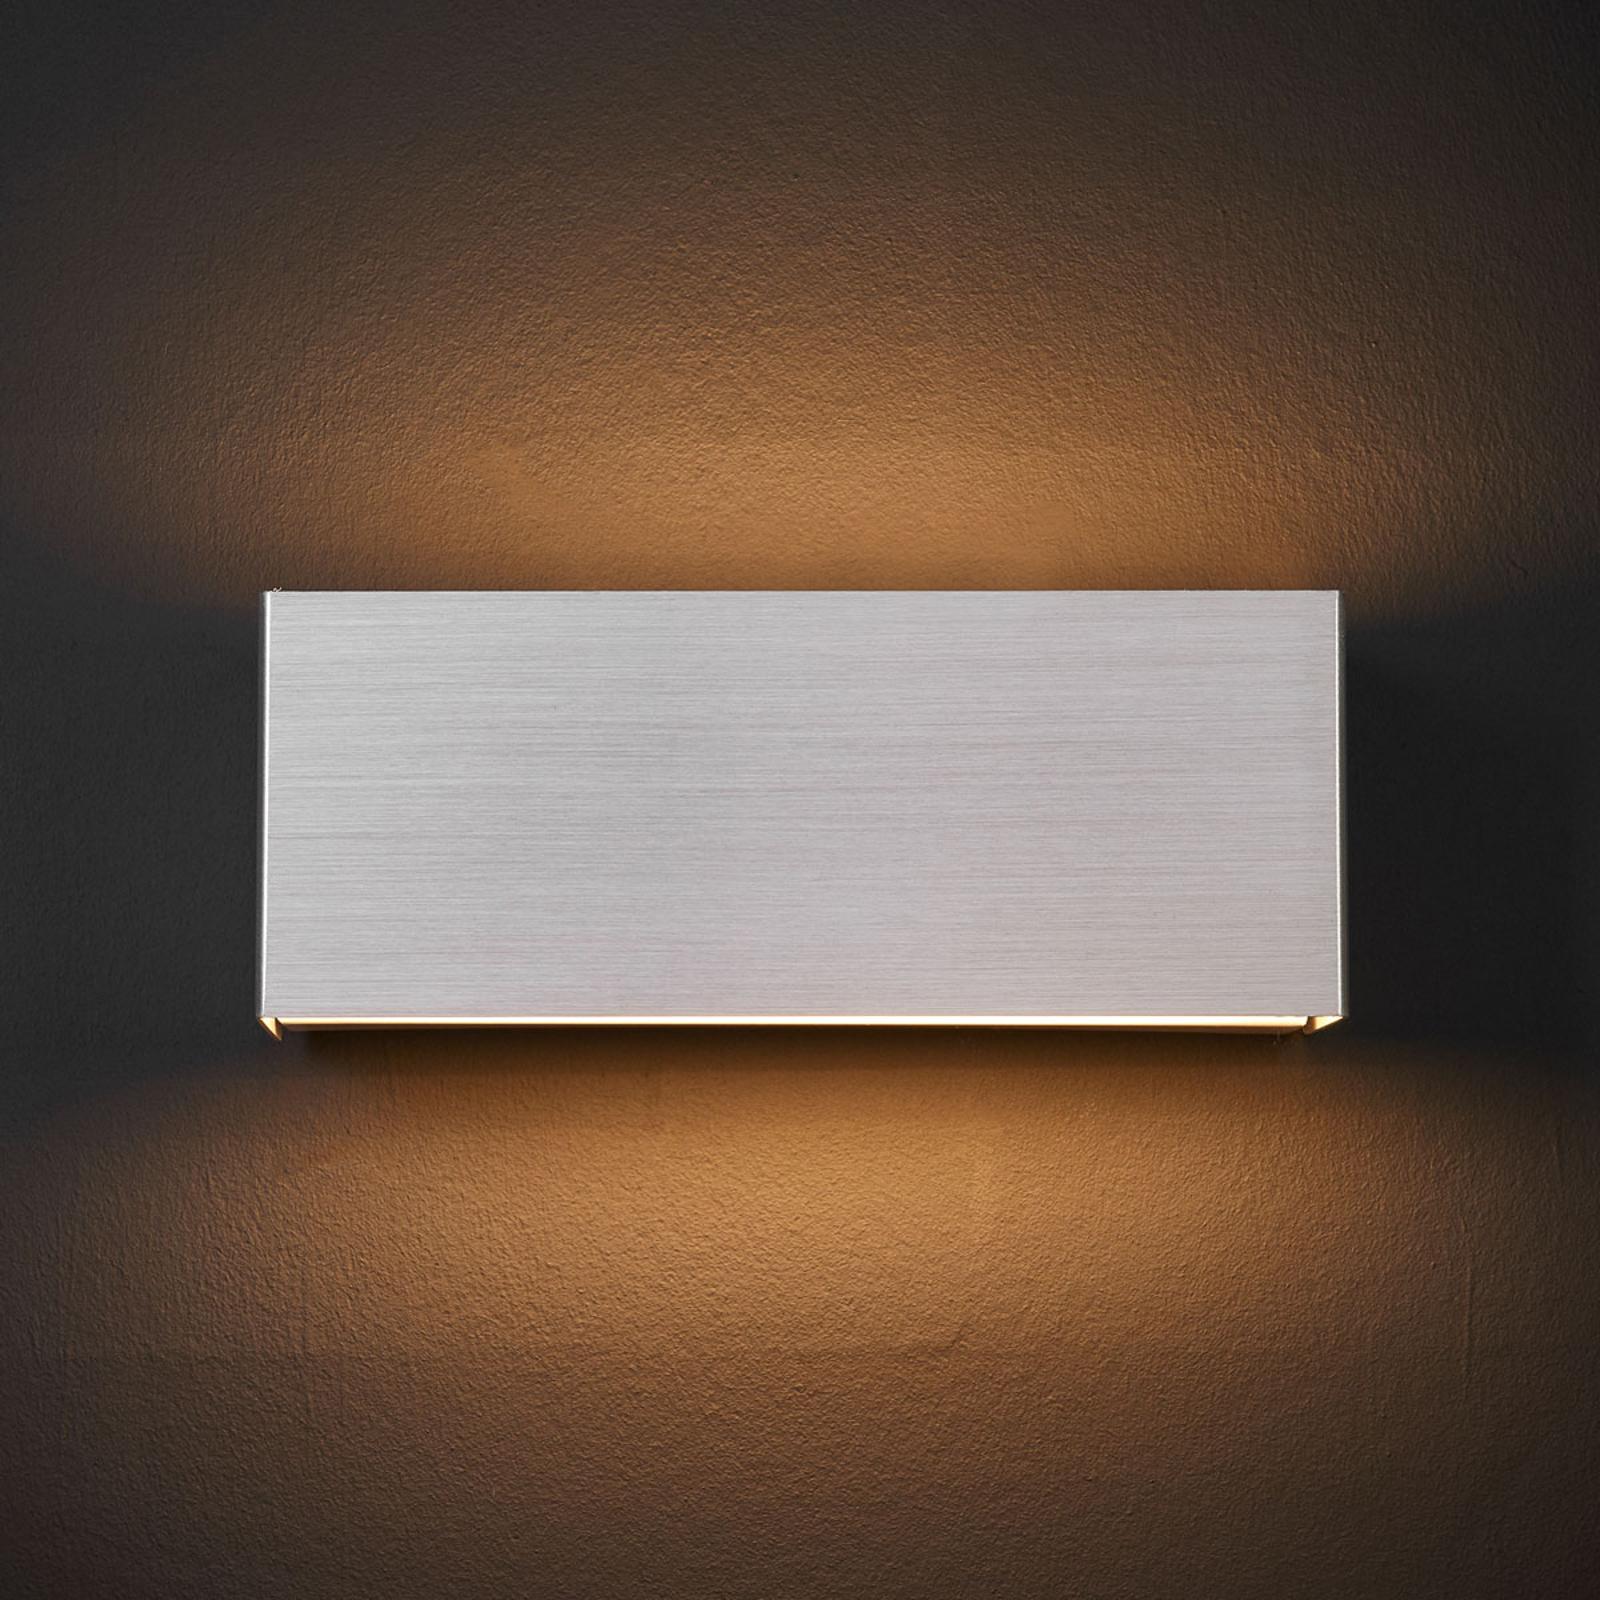 LED-vägglampa Kimberley, 23x9cm, aluminium